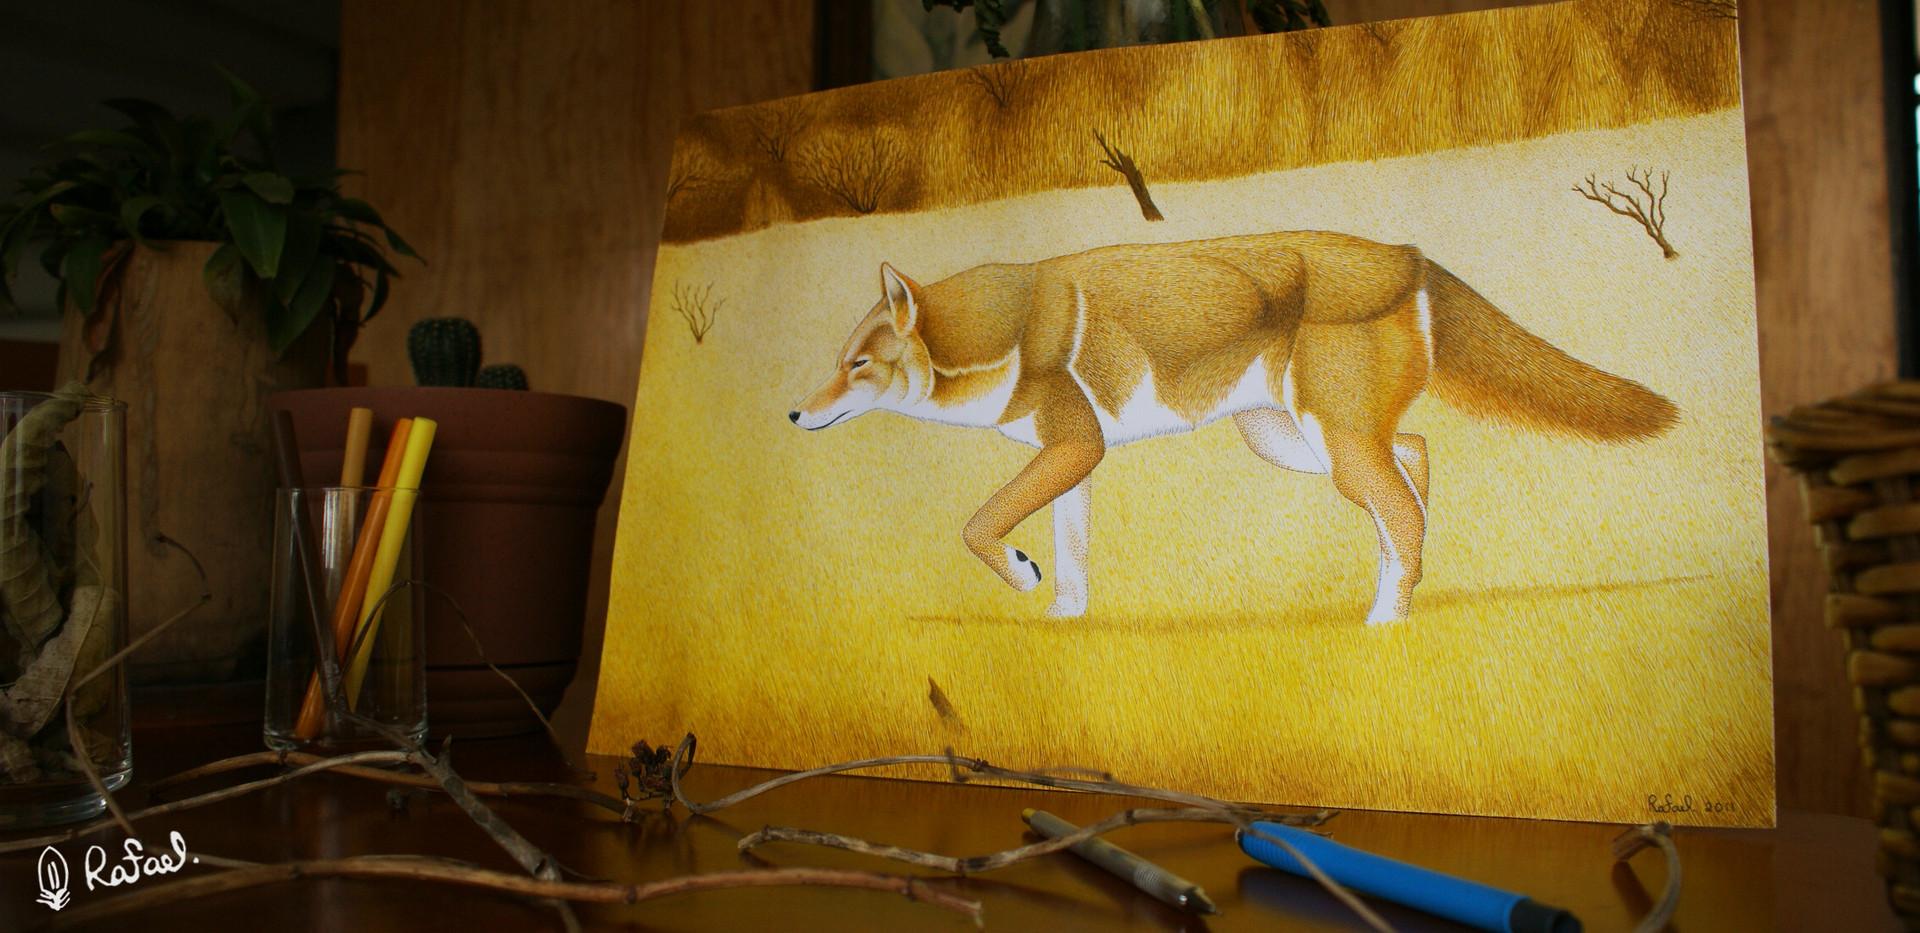 Coyote | Coyote